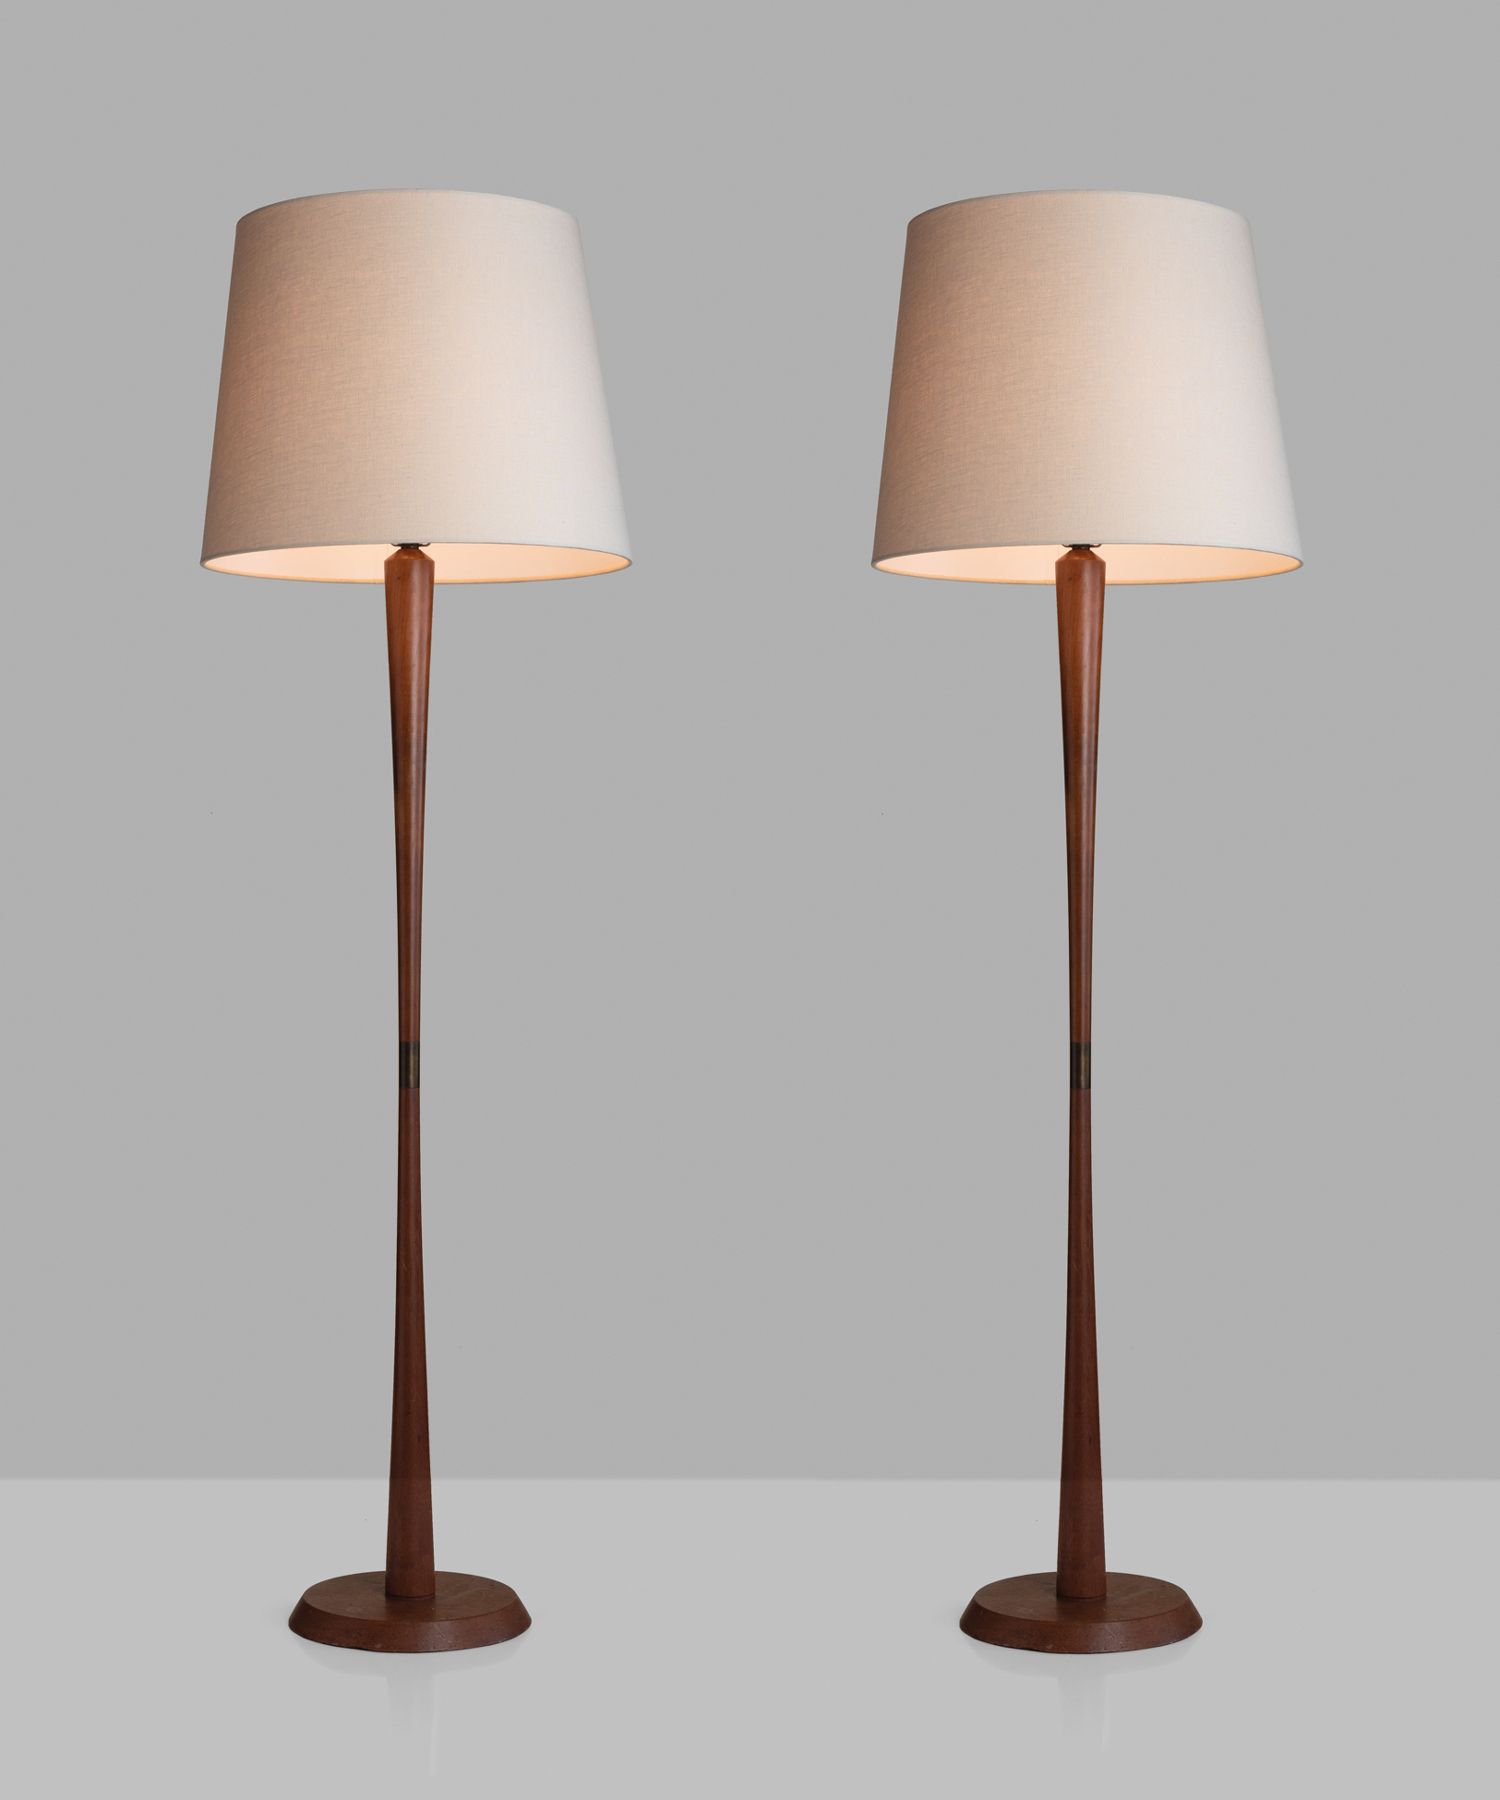 Pin On Design Lighting Lamps